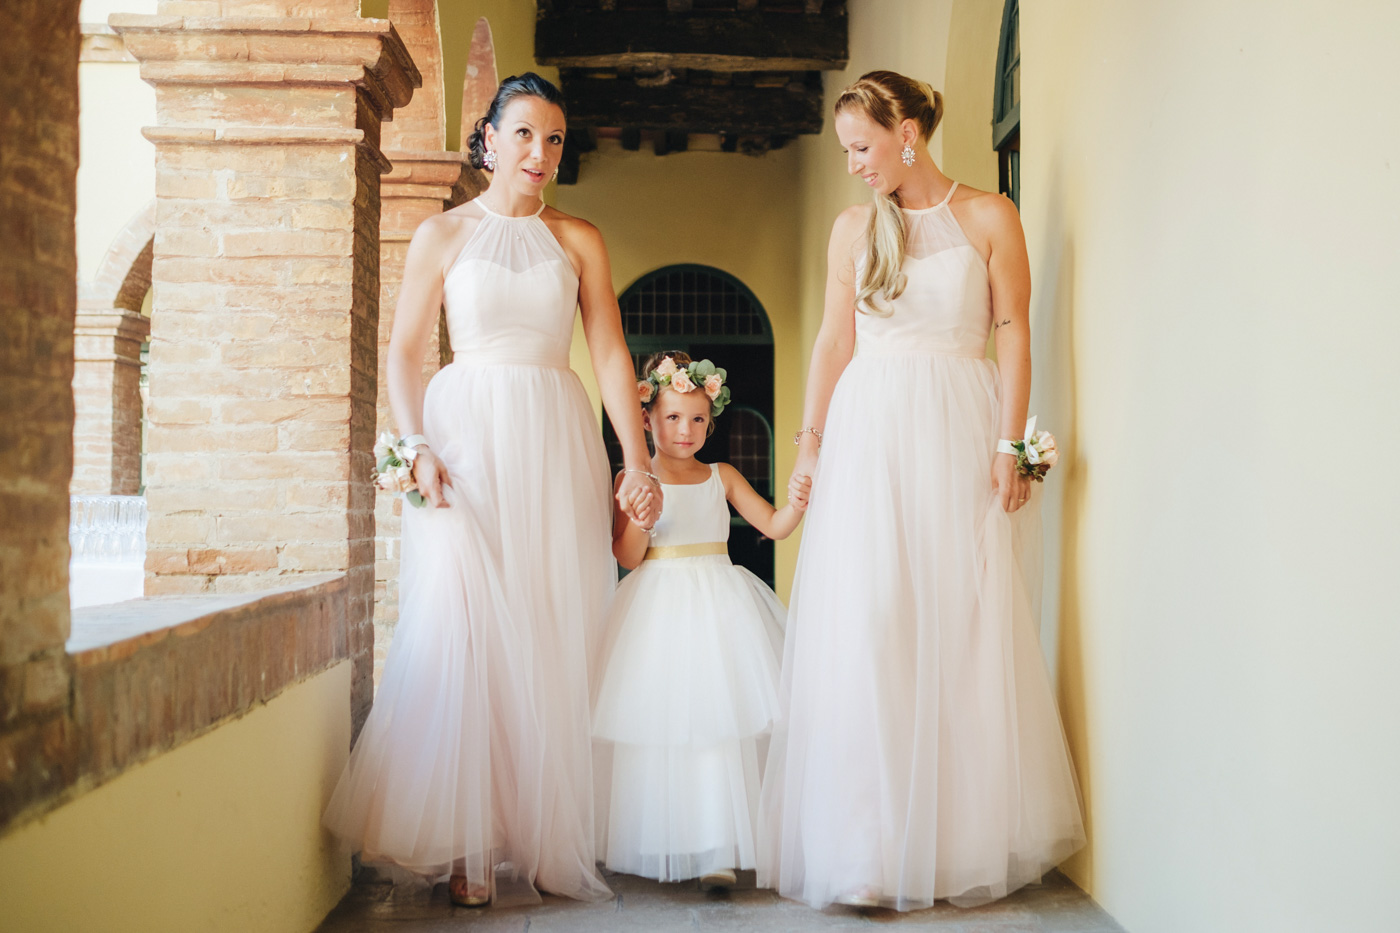 Matrimoni all'italiana wedding photographer italy-51.jpg